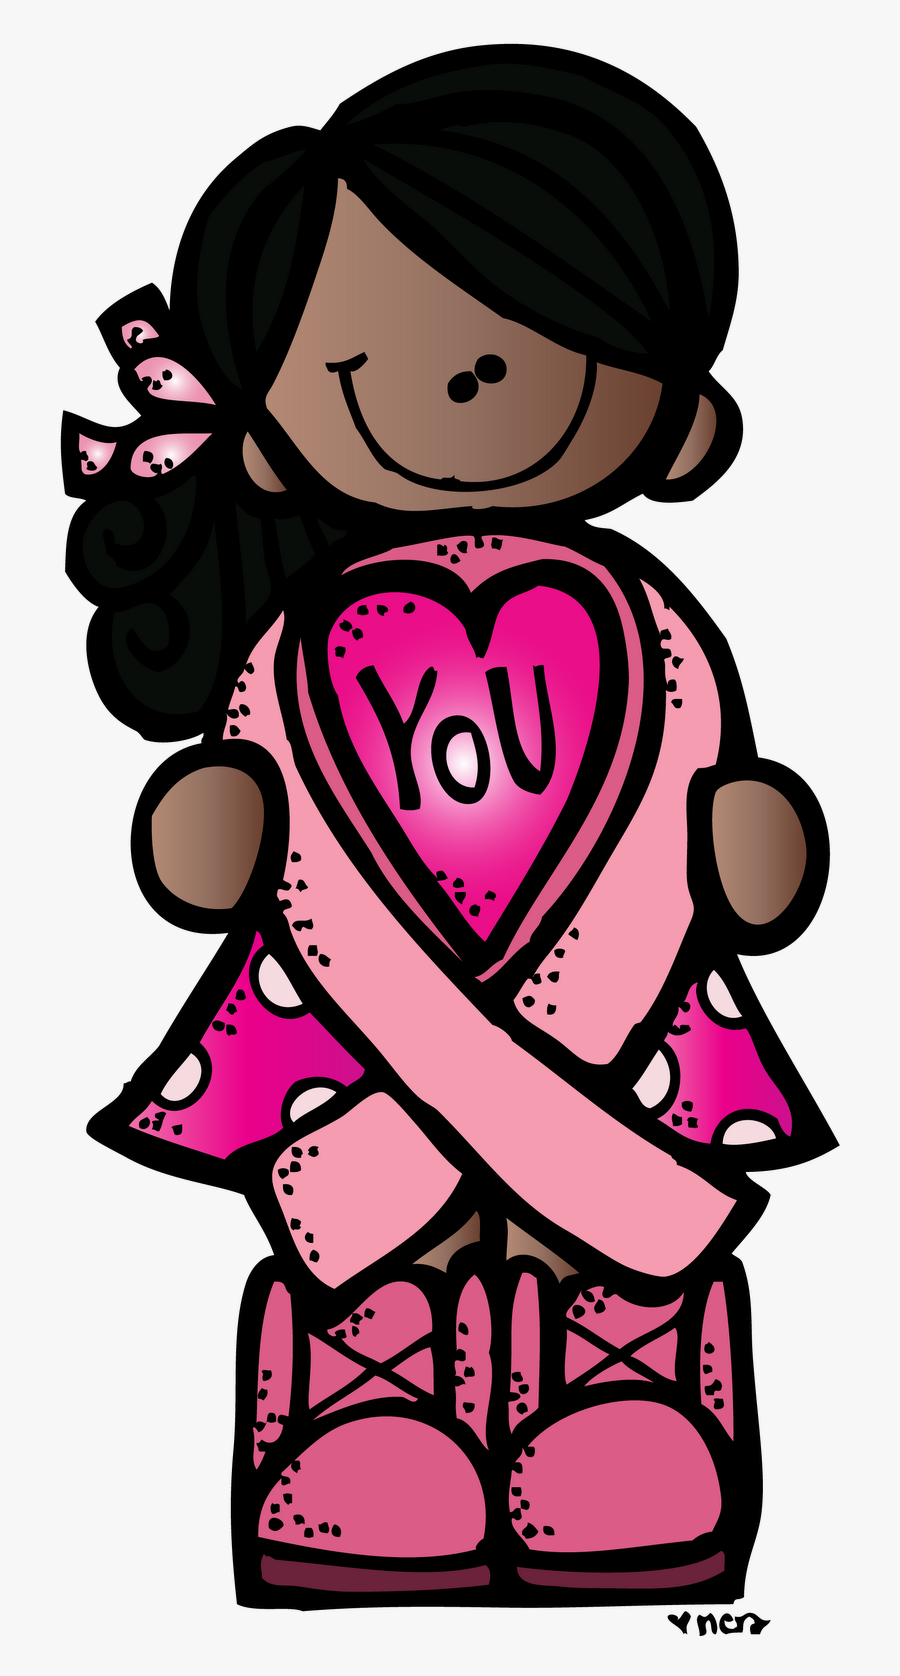 Gold Cancer Ribbon Clip Art Gold Clipart Awareness - Breast Cancer Awareness, Transparent Clipart